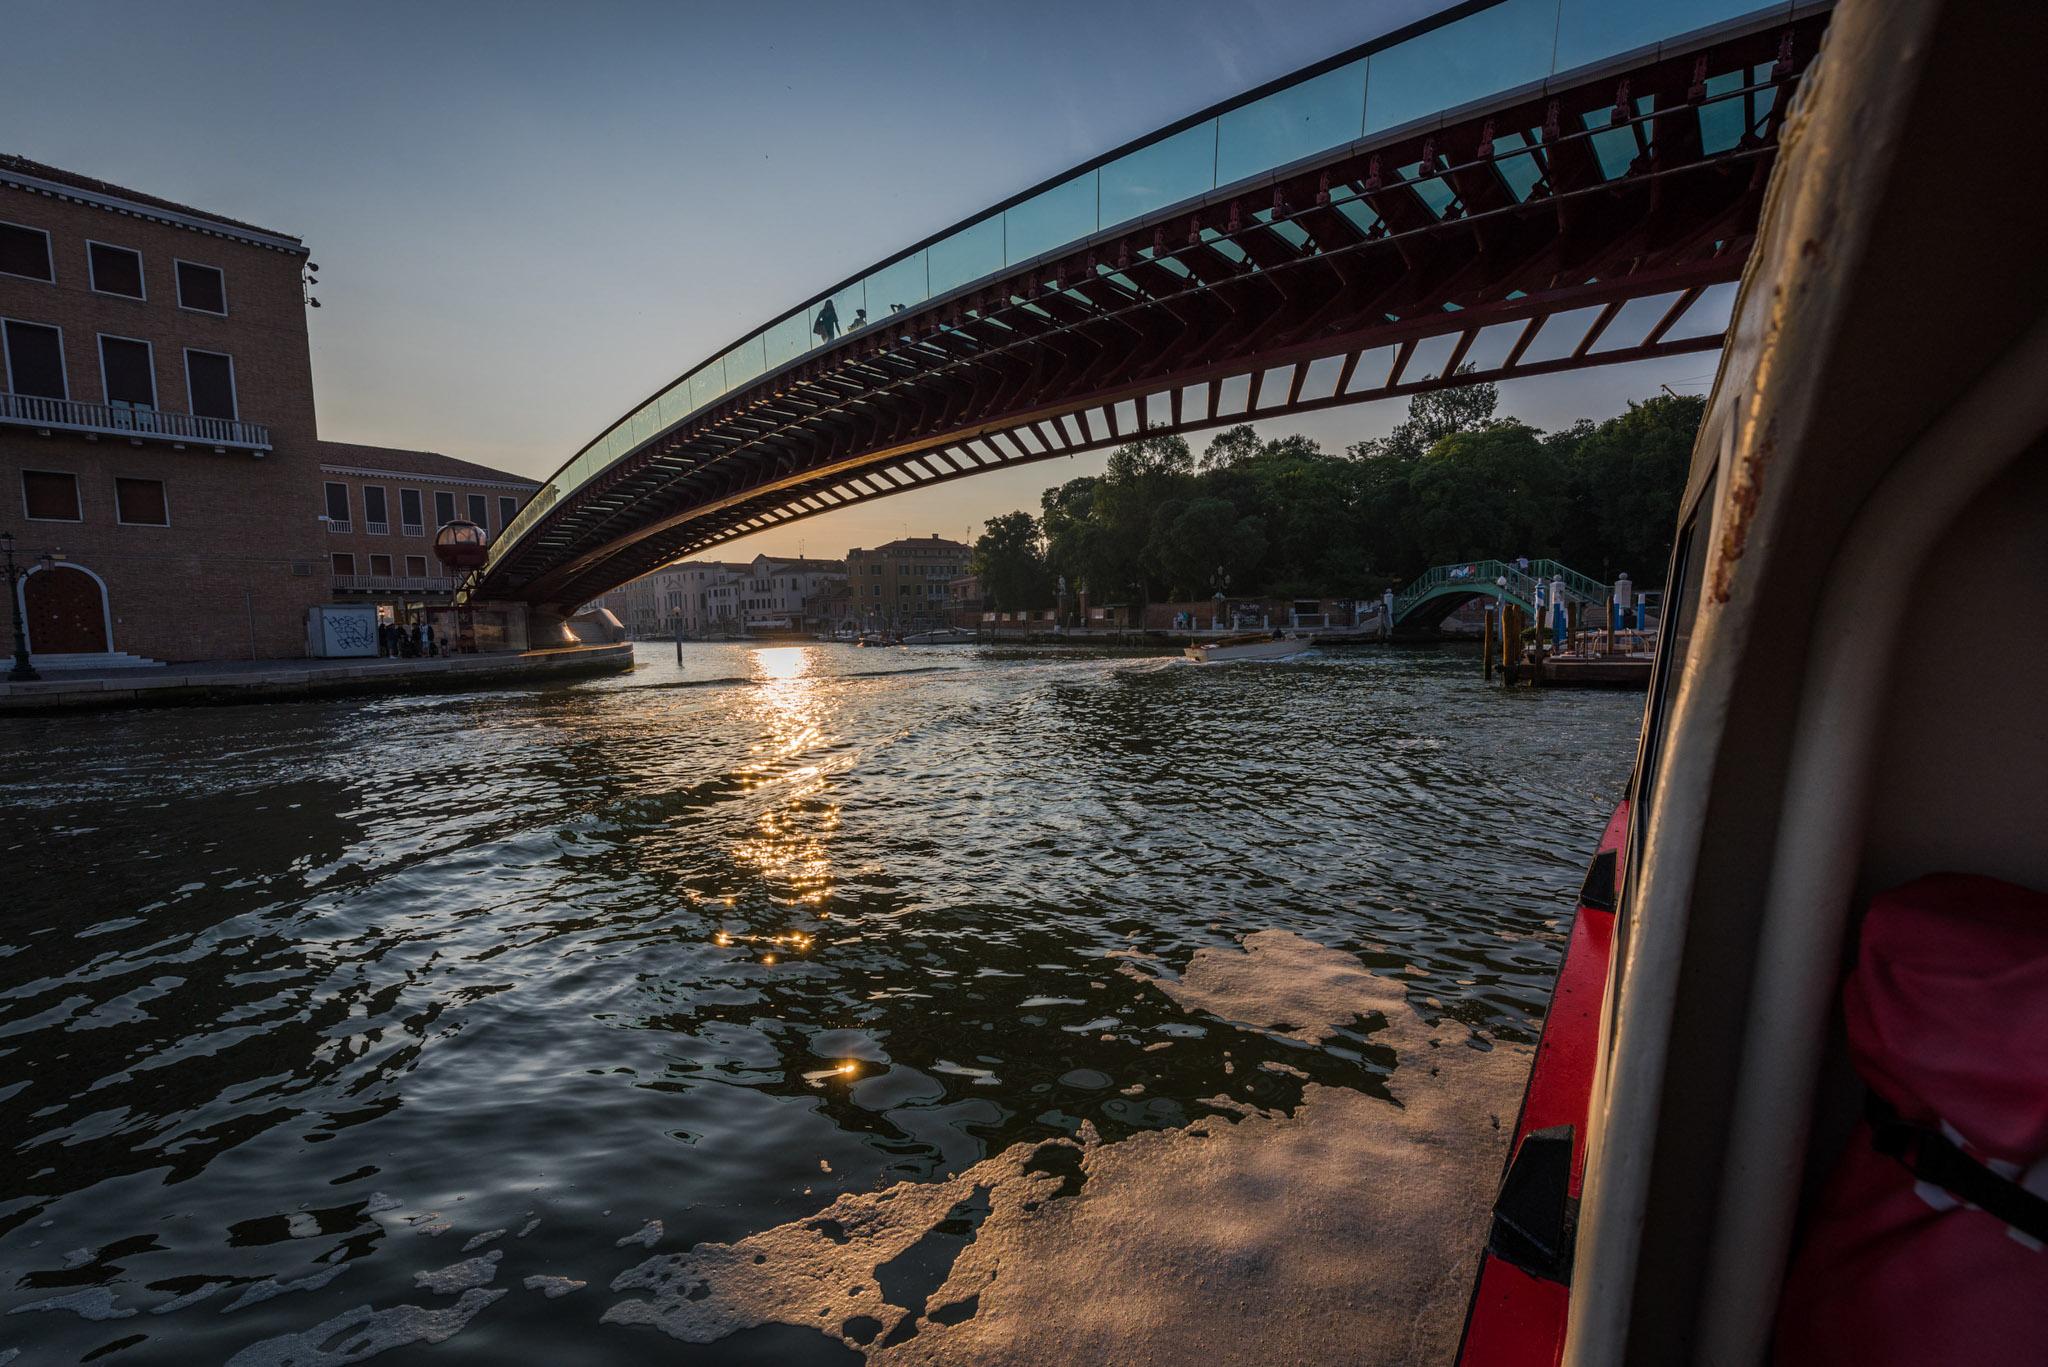 Auf dem Boot (Foto: Niklas Neubauer)